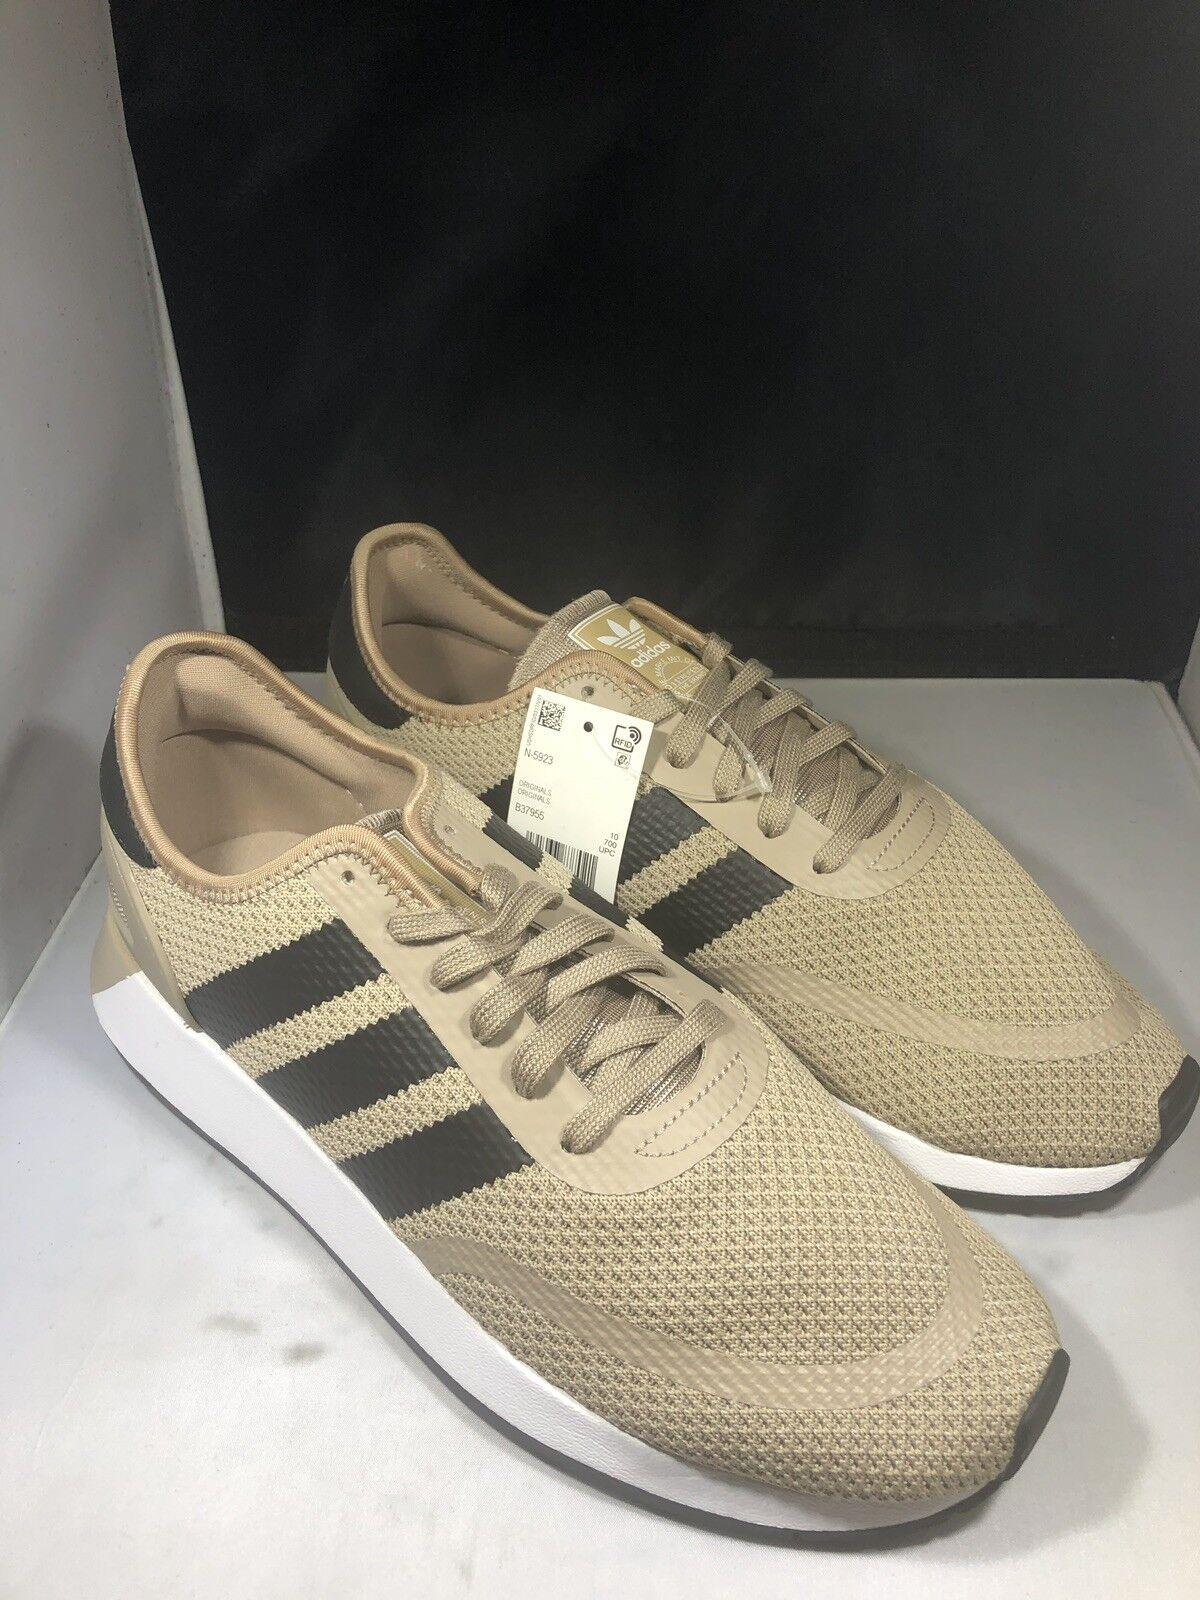 Details about Adidas Men Originals NIZZA Casual Shoes Running Black White Sneakers Shoe CQ2332